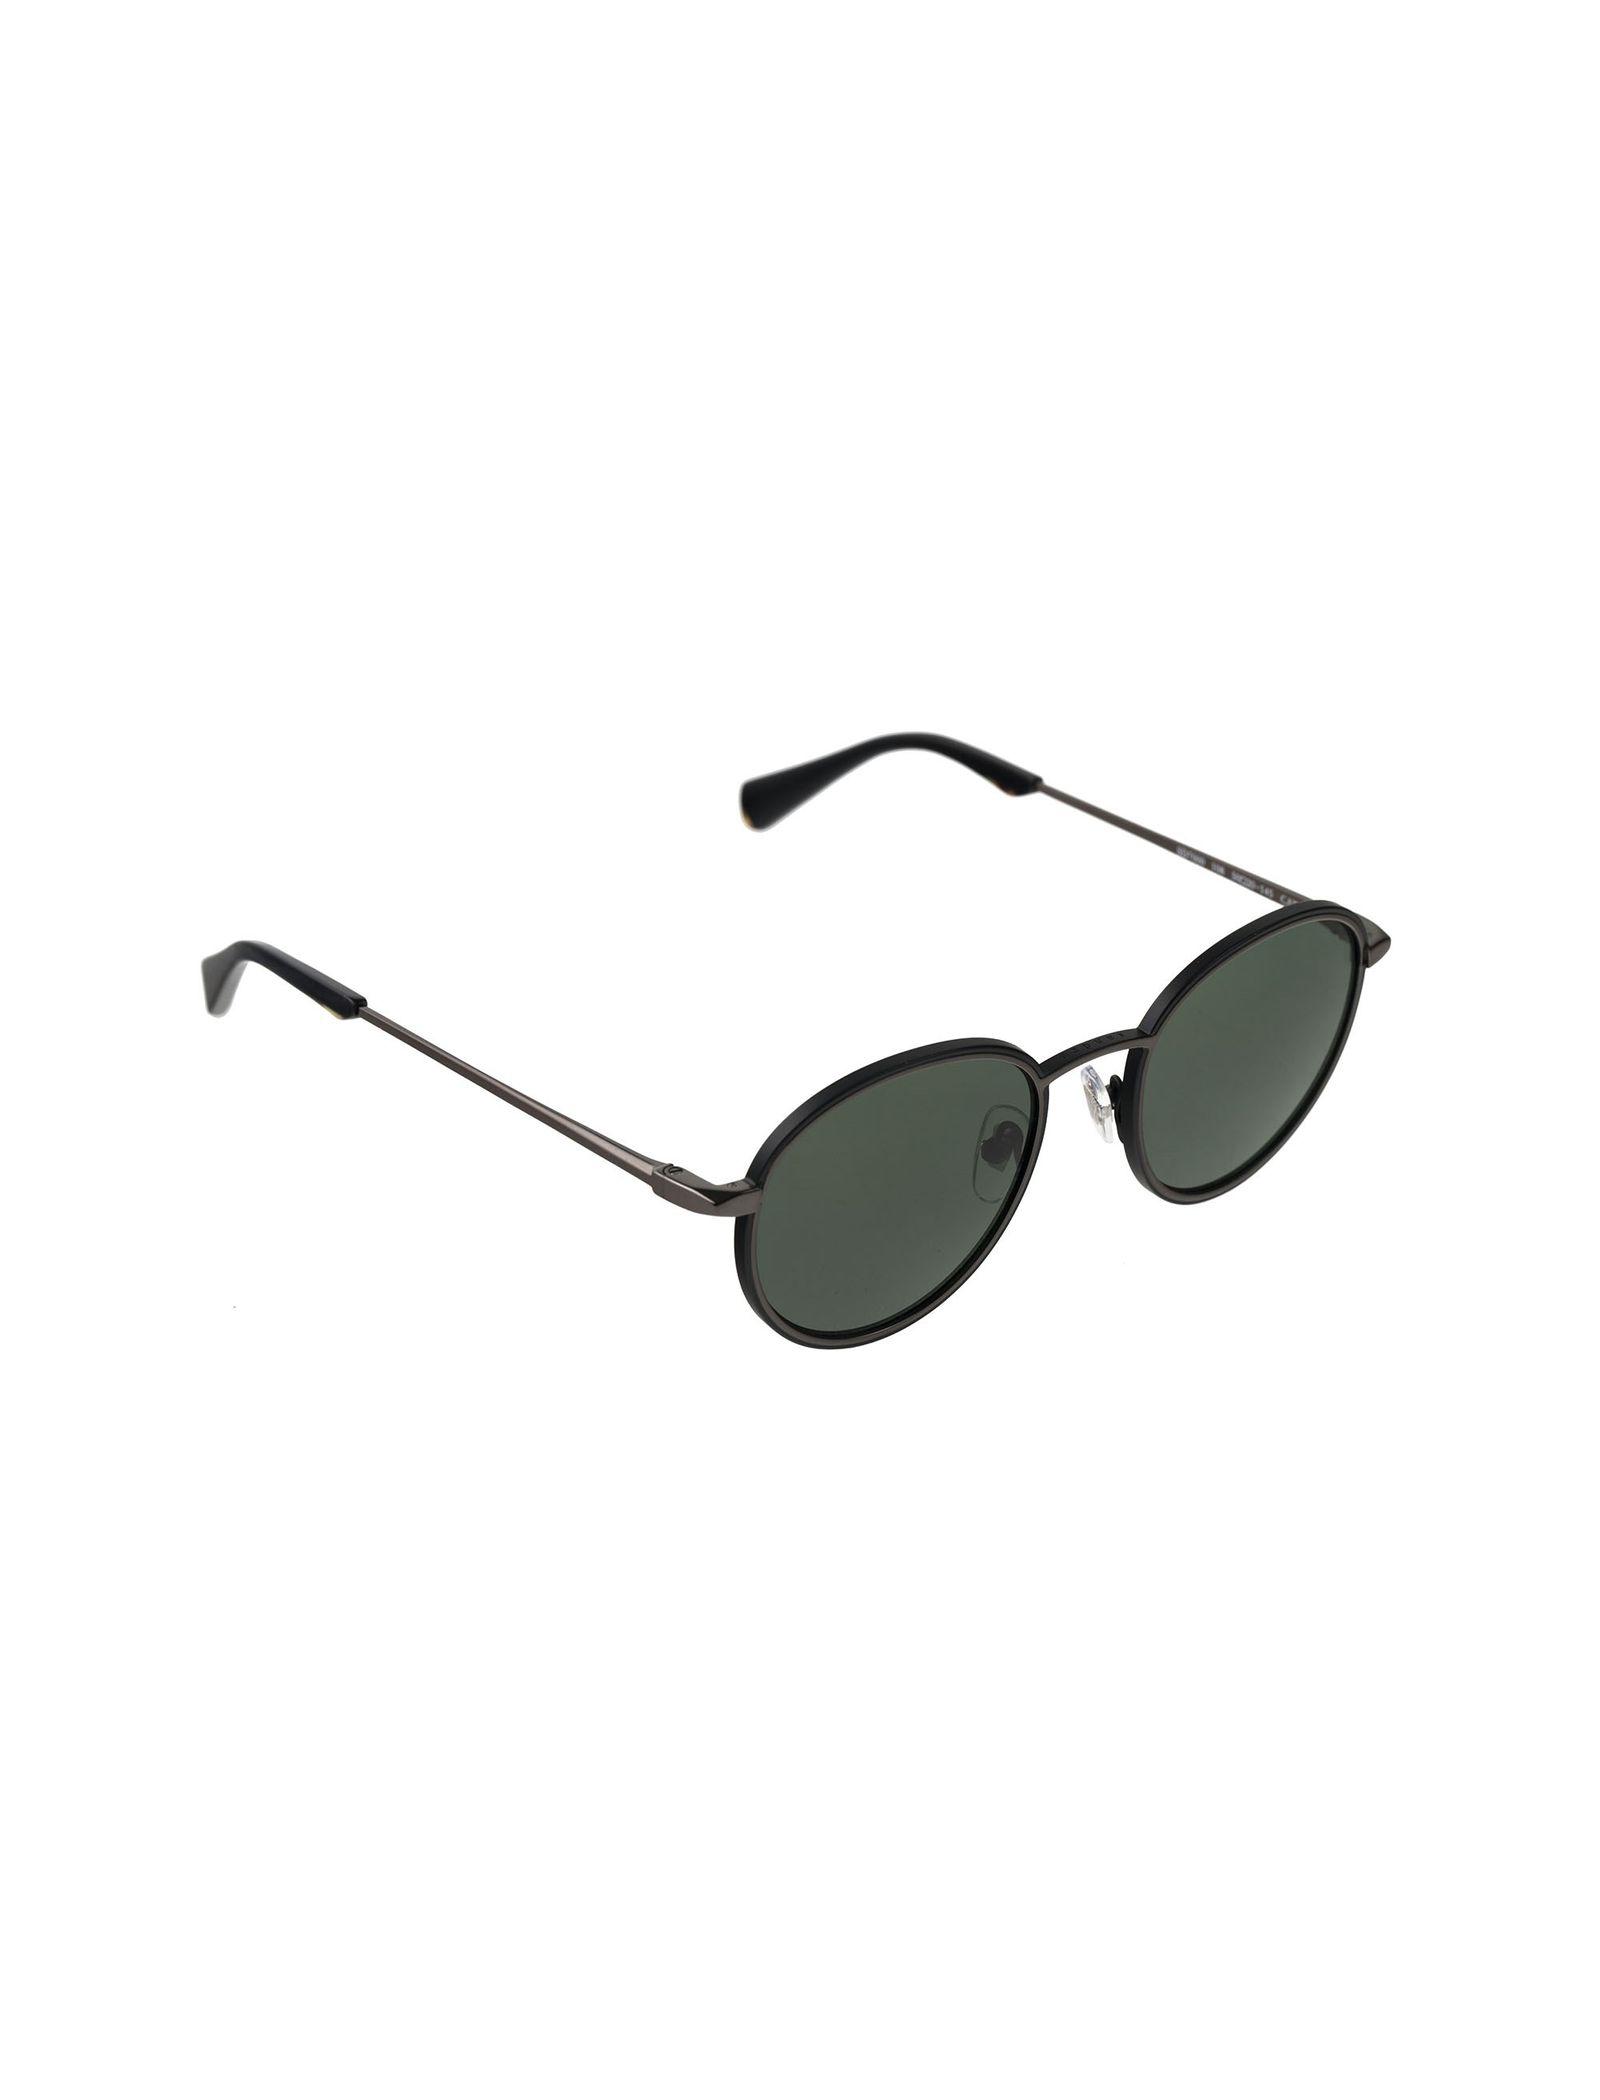 عینک آفتابی گرد زنانه - ساندرو - زغالي      - 2